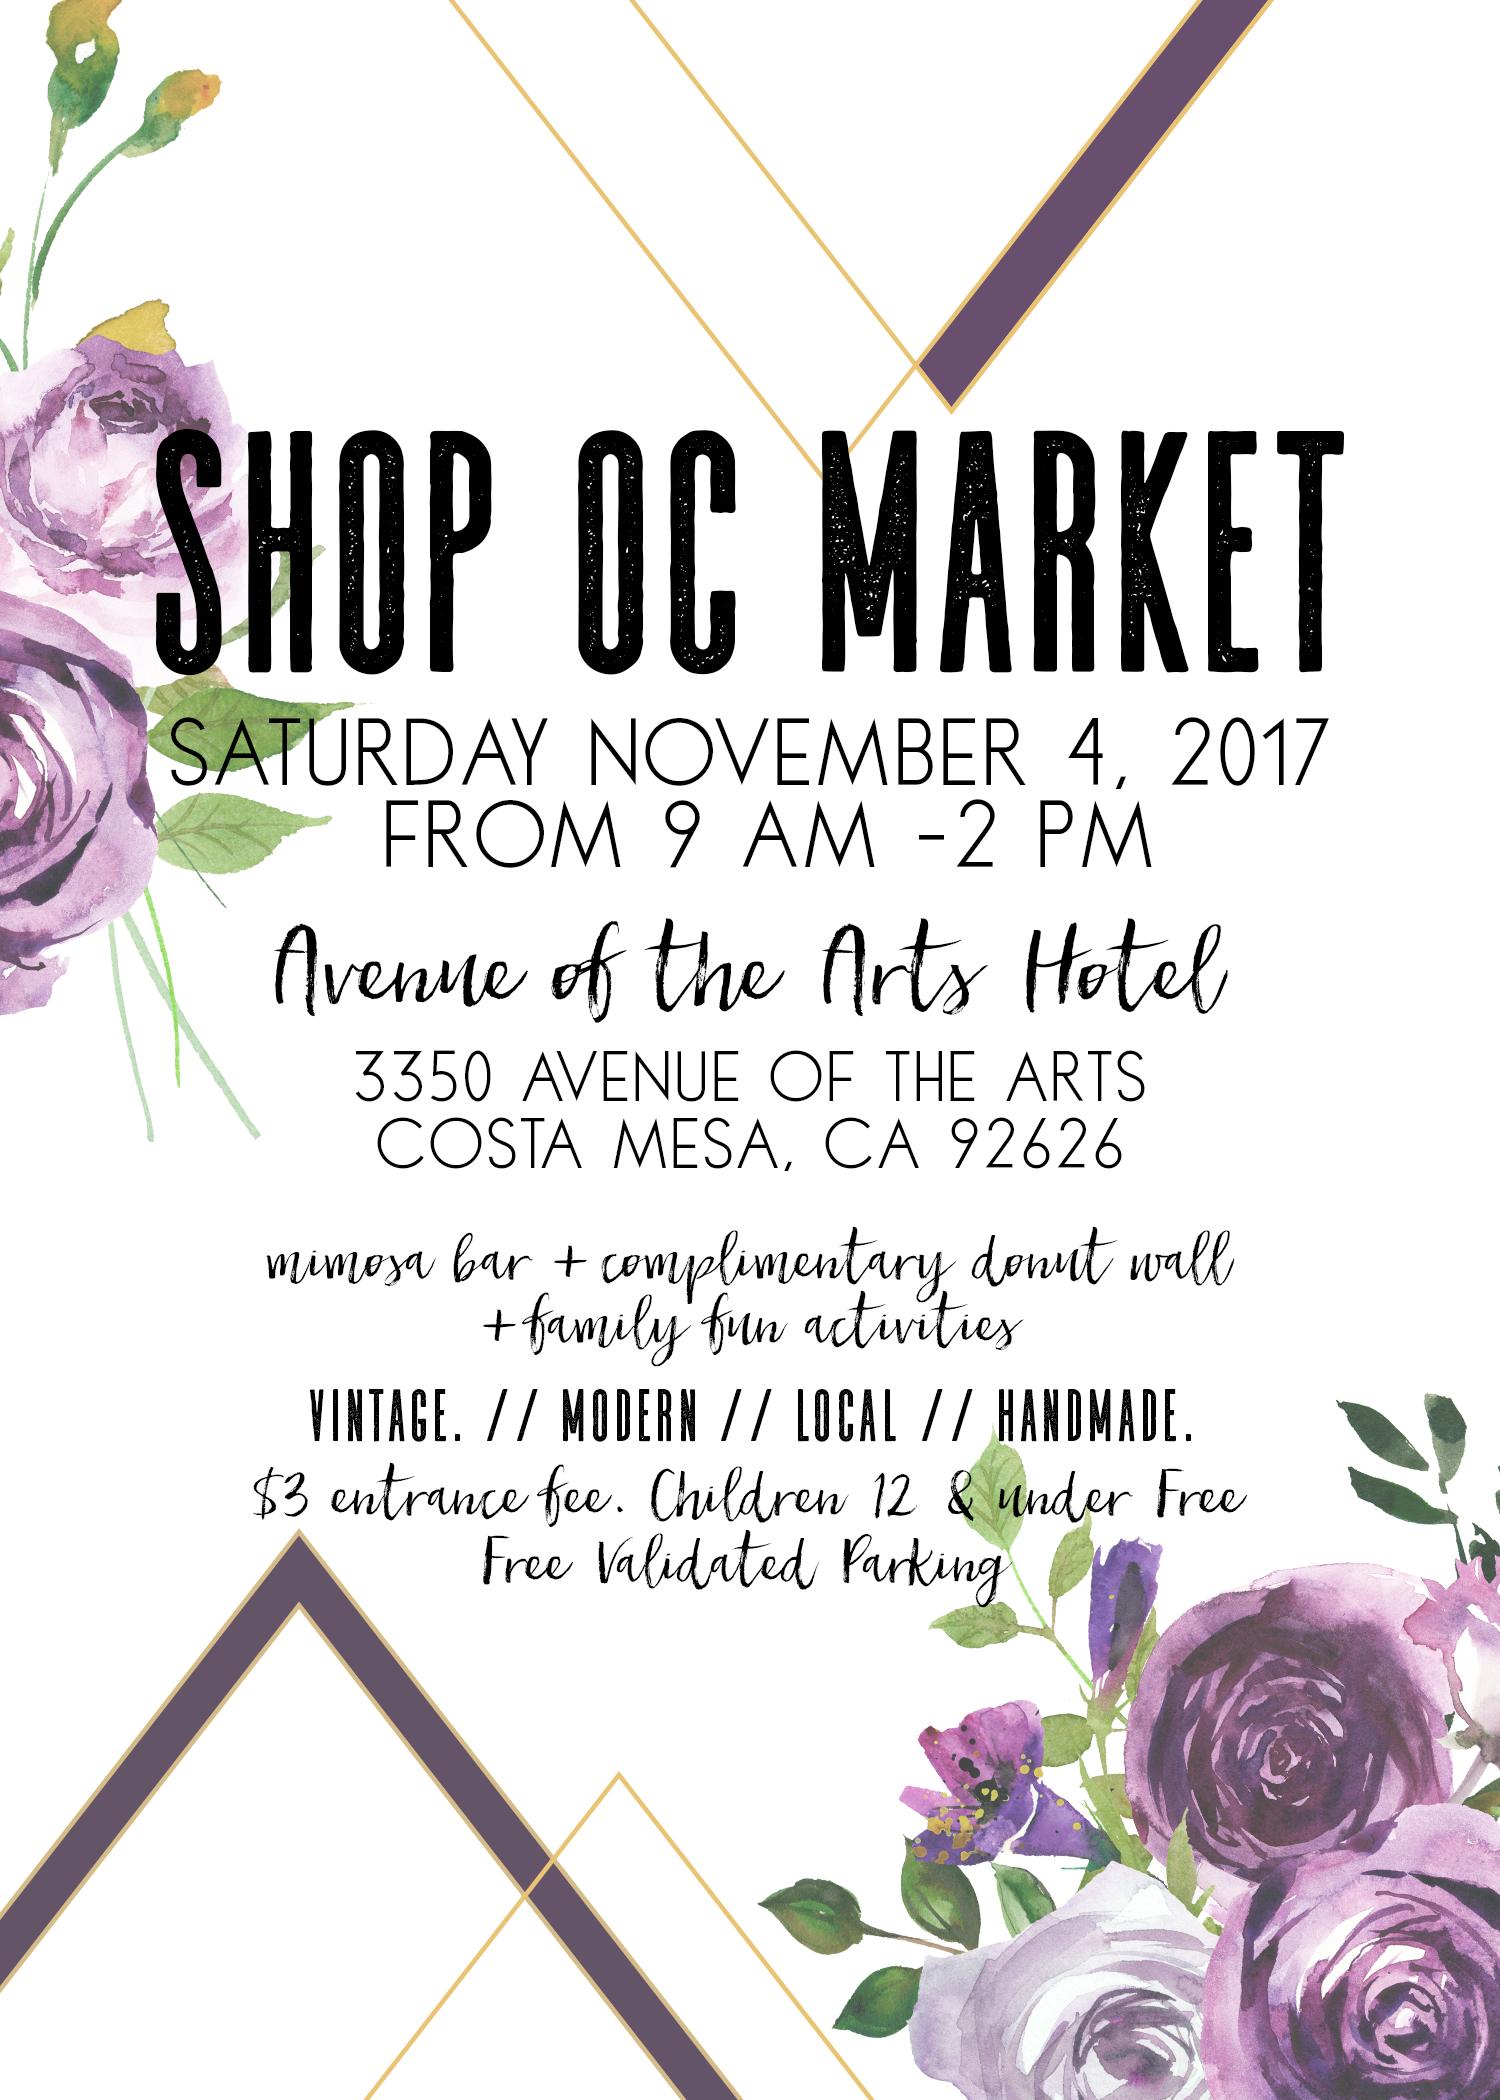 shop-oc-market-promotion-flyer-via-redeeming-eden-events.jpg